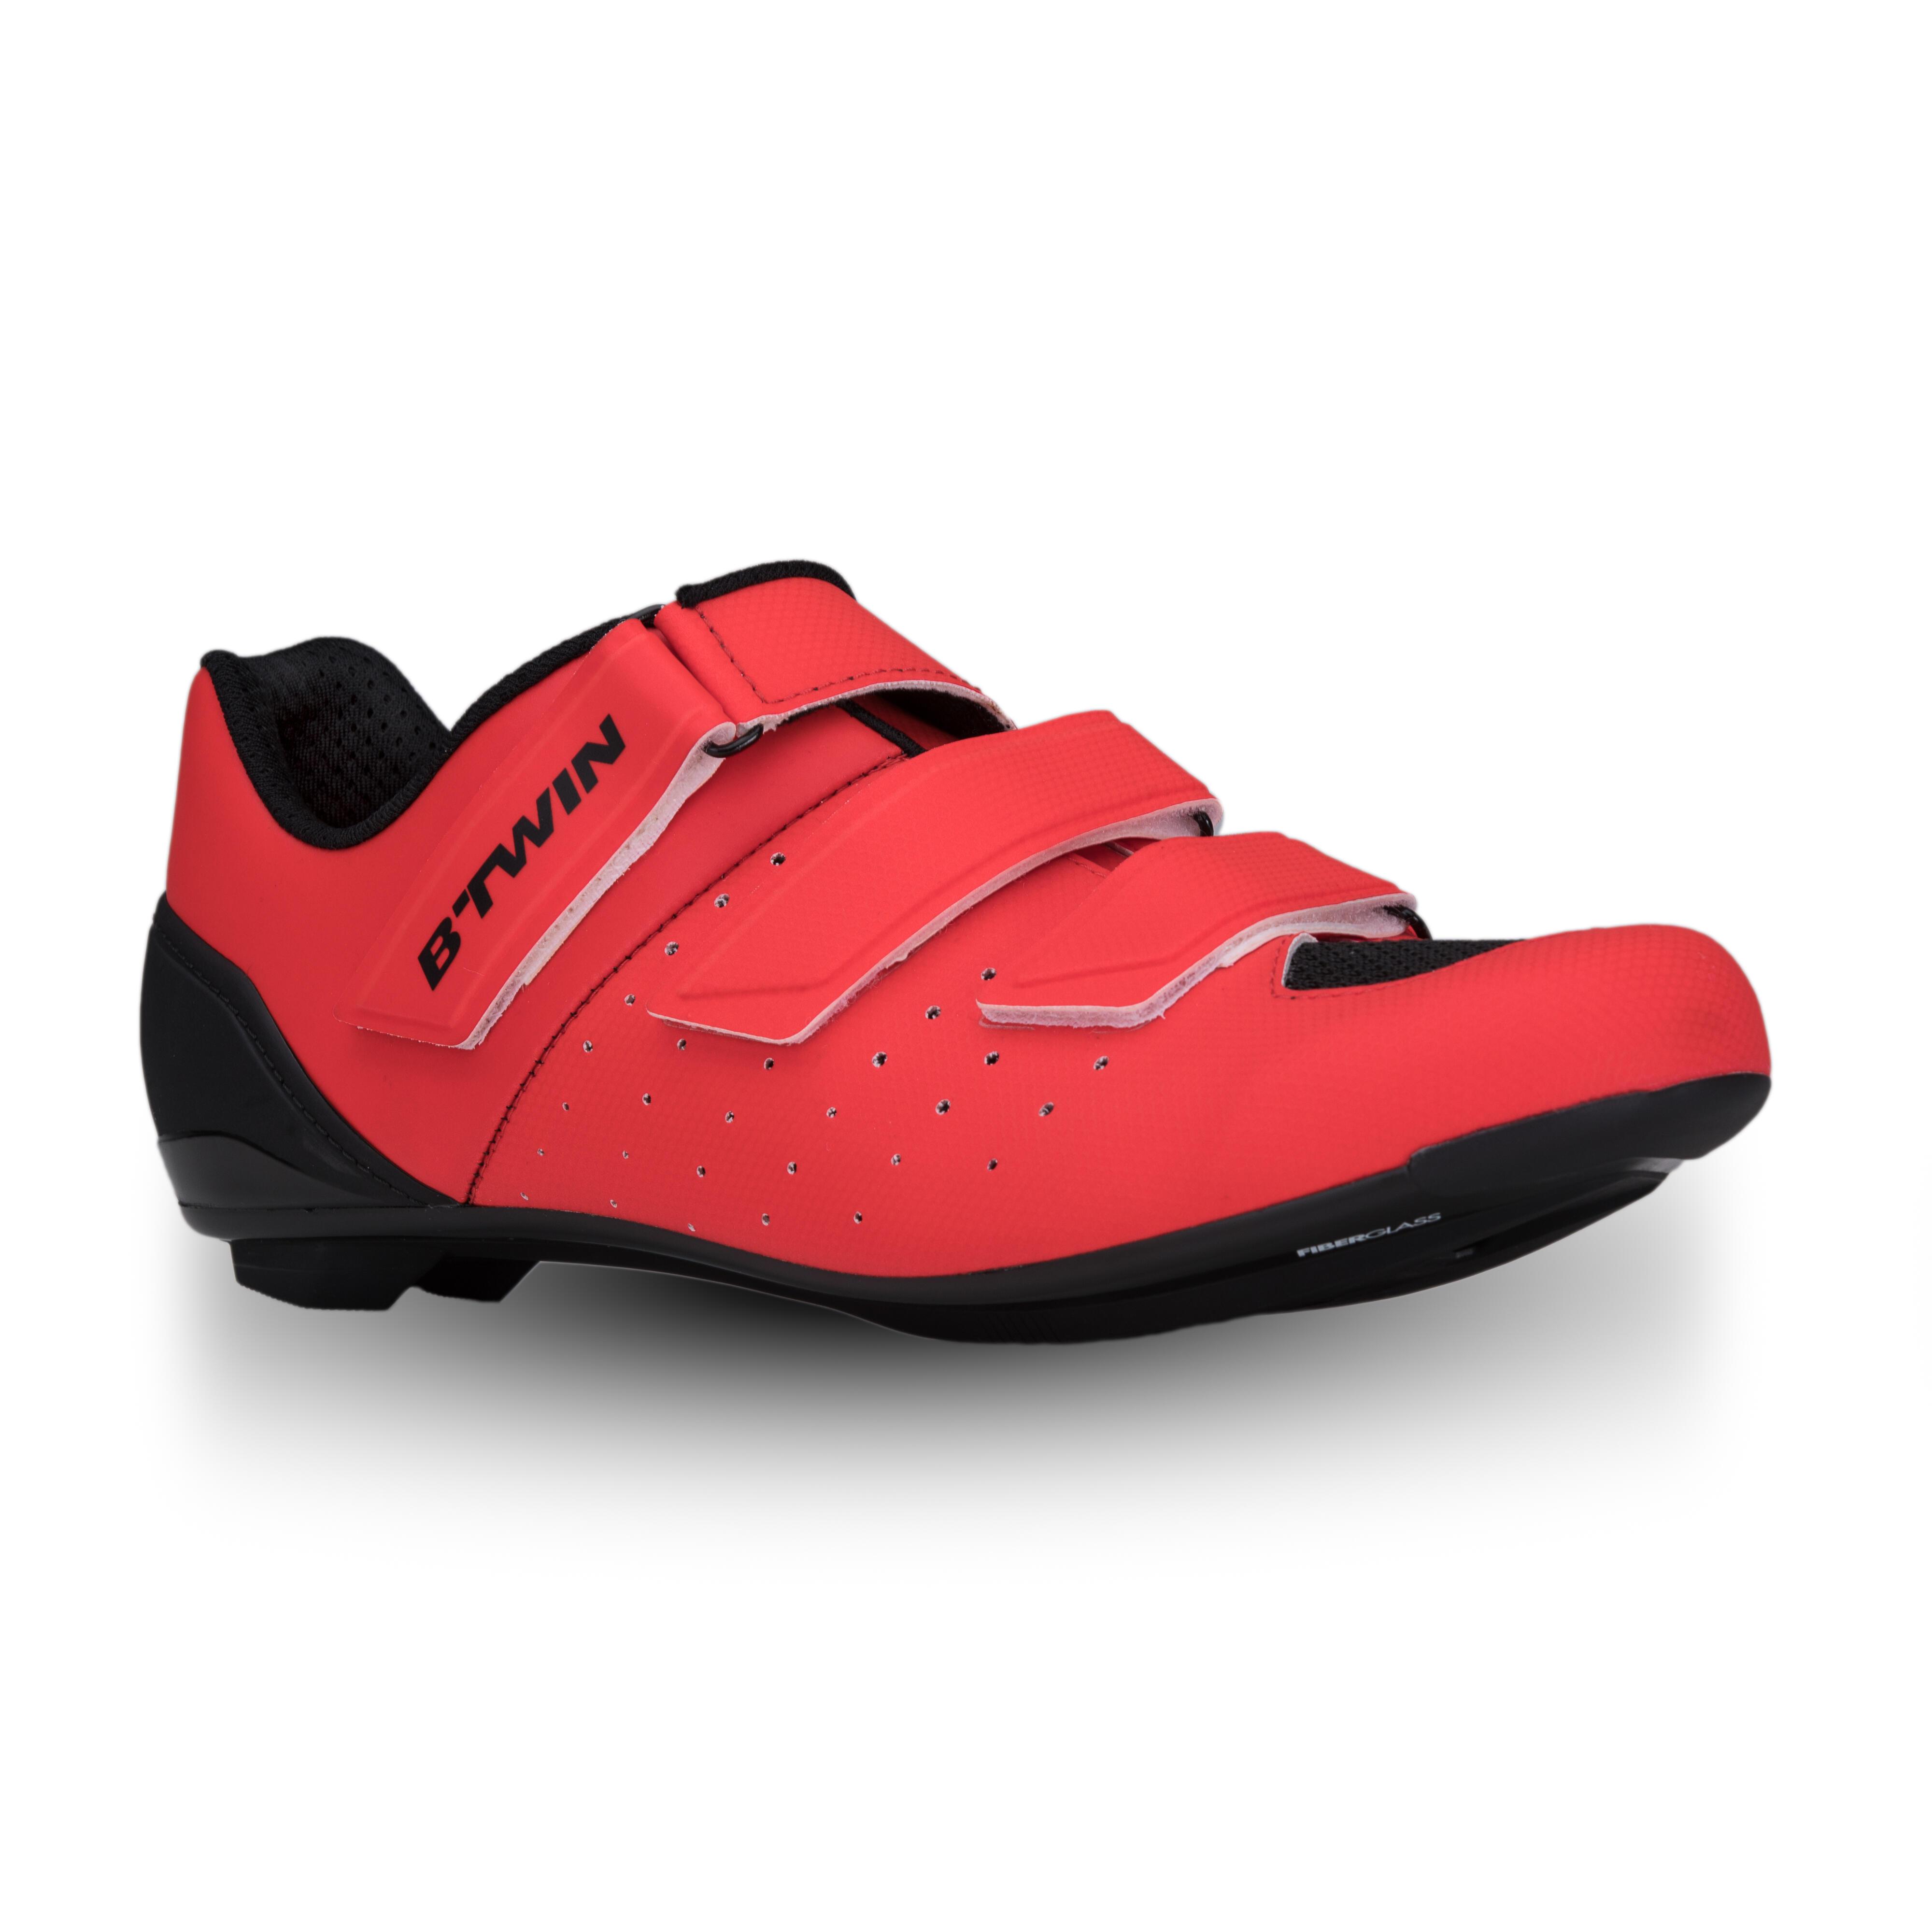 Fahrrad-Schuhe Rennrad RR 500 rot | Schuhe > Sportschuhe > Fahrradschuhe | Rot | B´twin